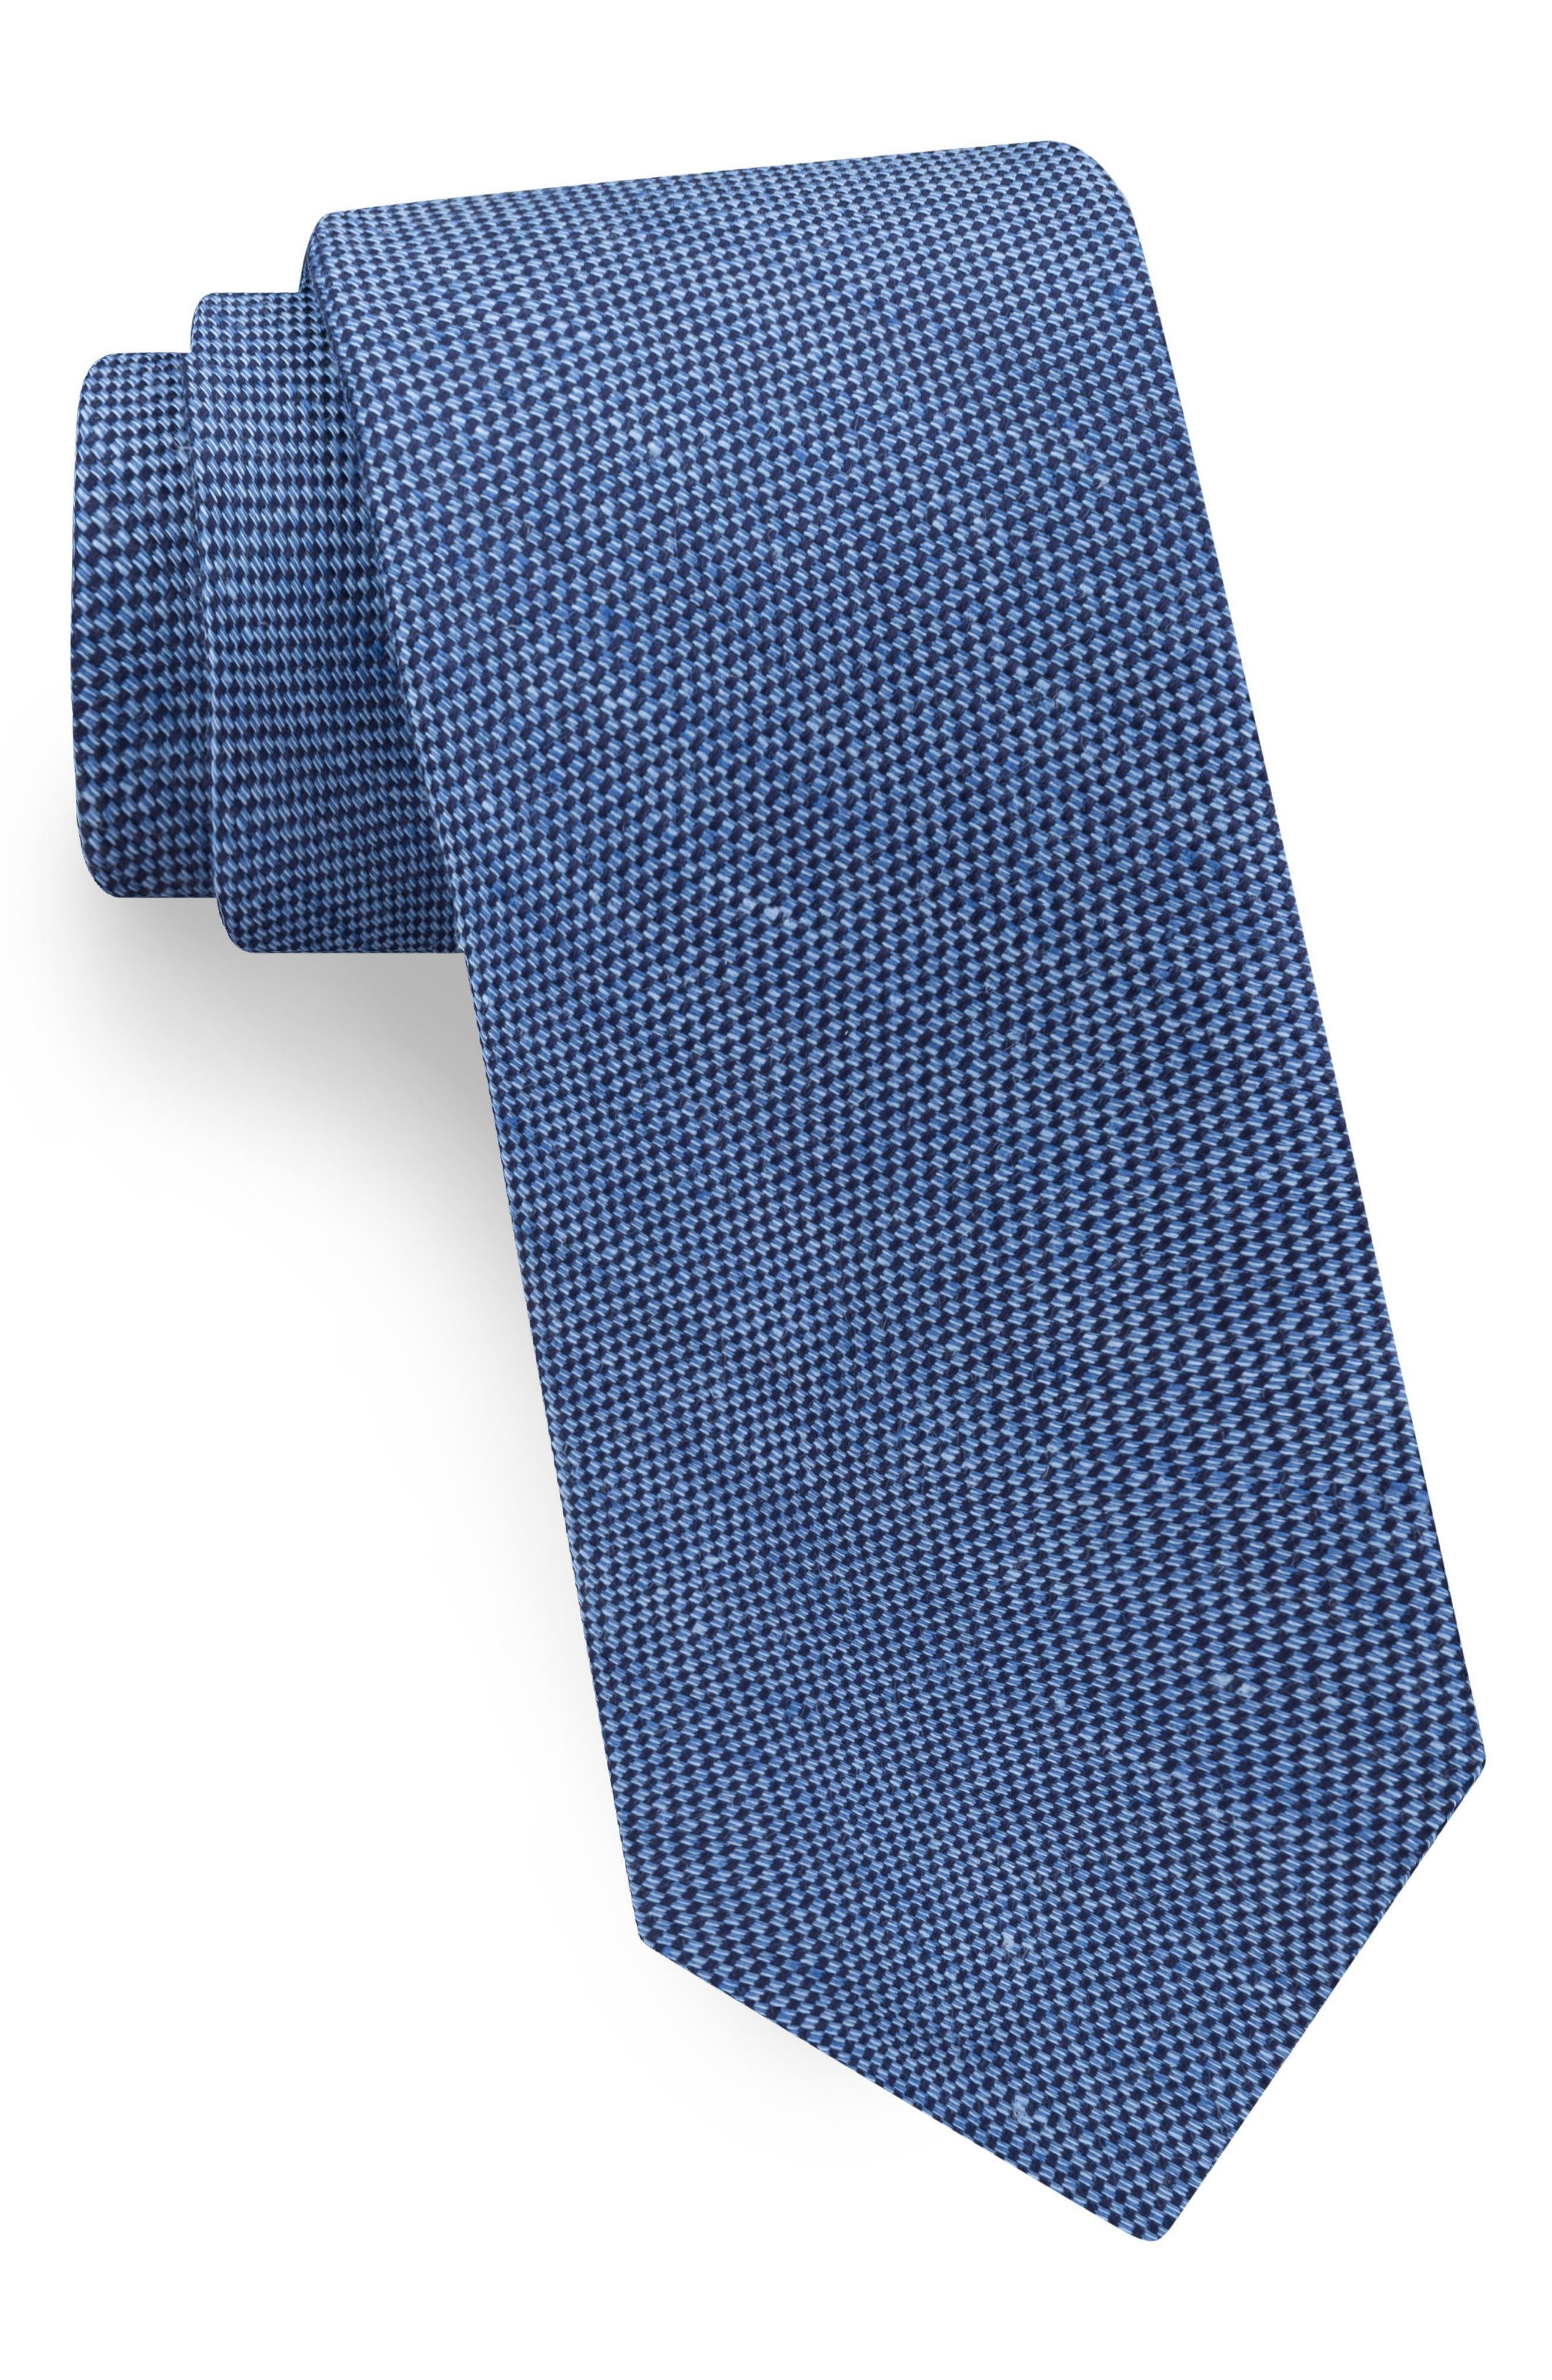 Ted Baker London Textured Linen & Silk Tie